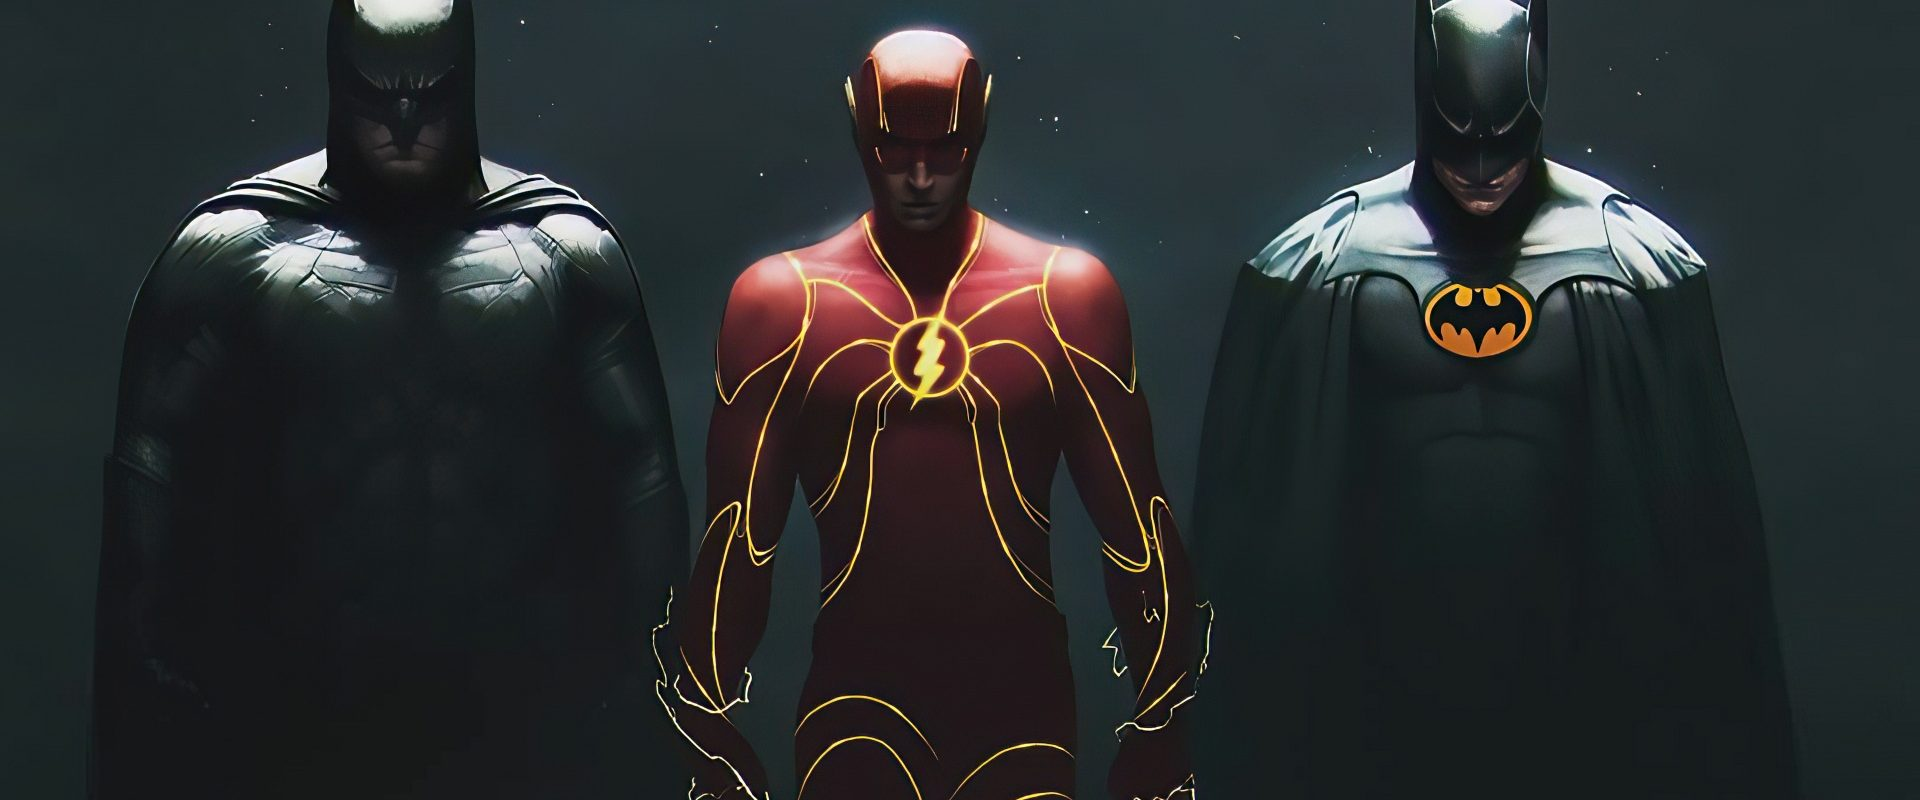 the_flash_2022_movie_two_versions_of_batman-wallpaper-1920x1080